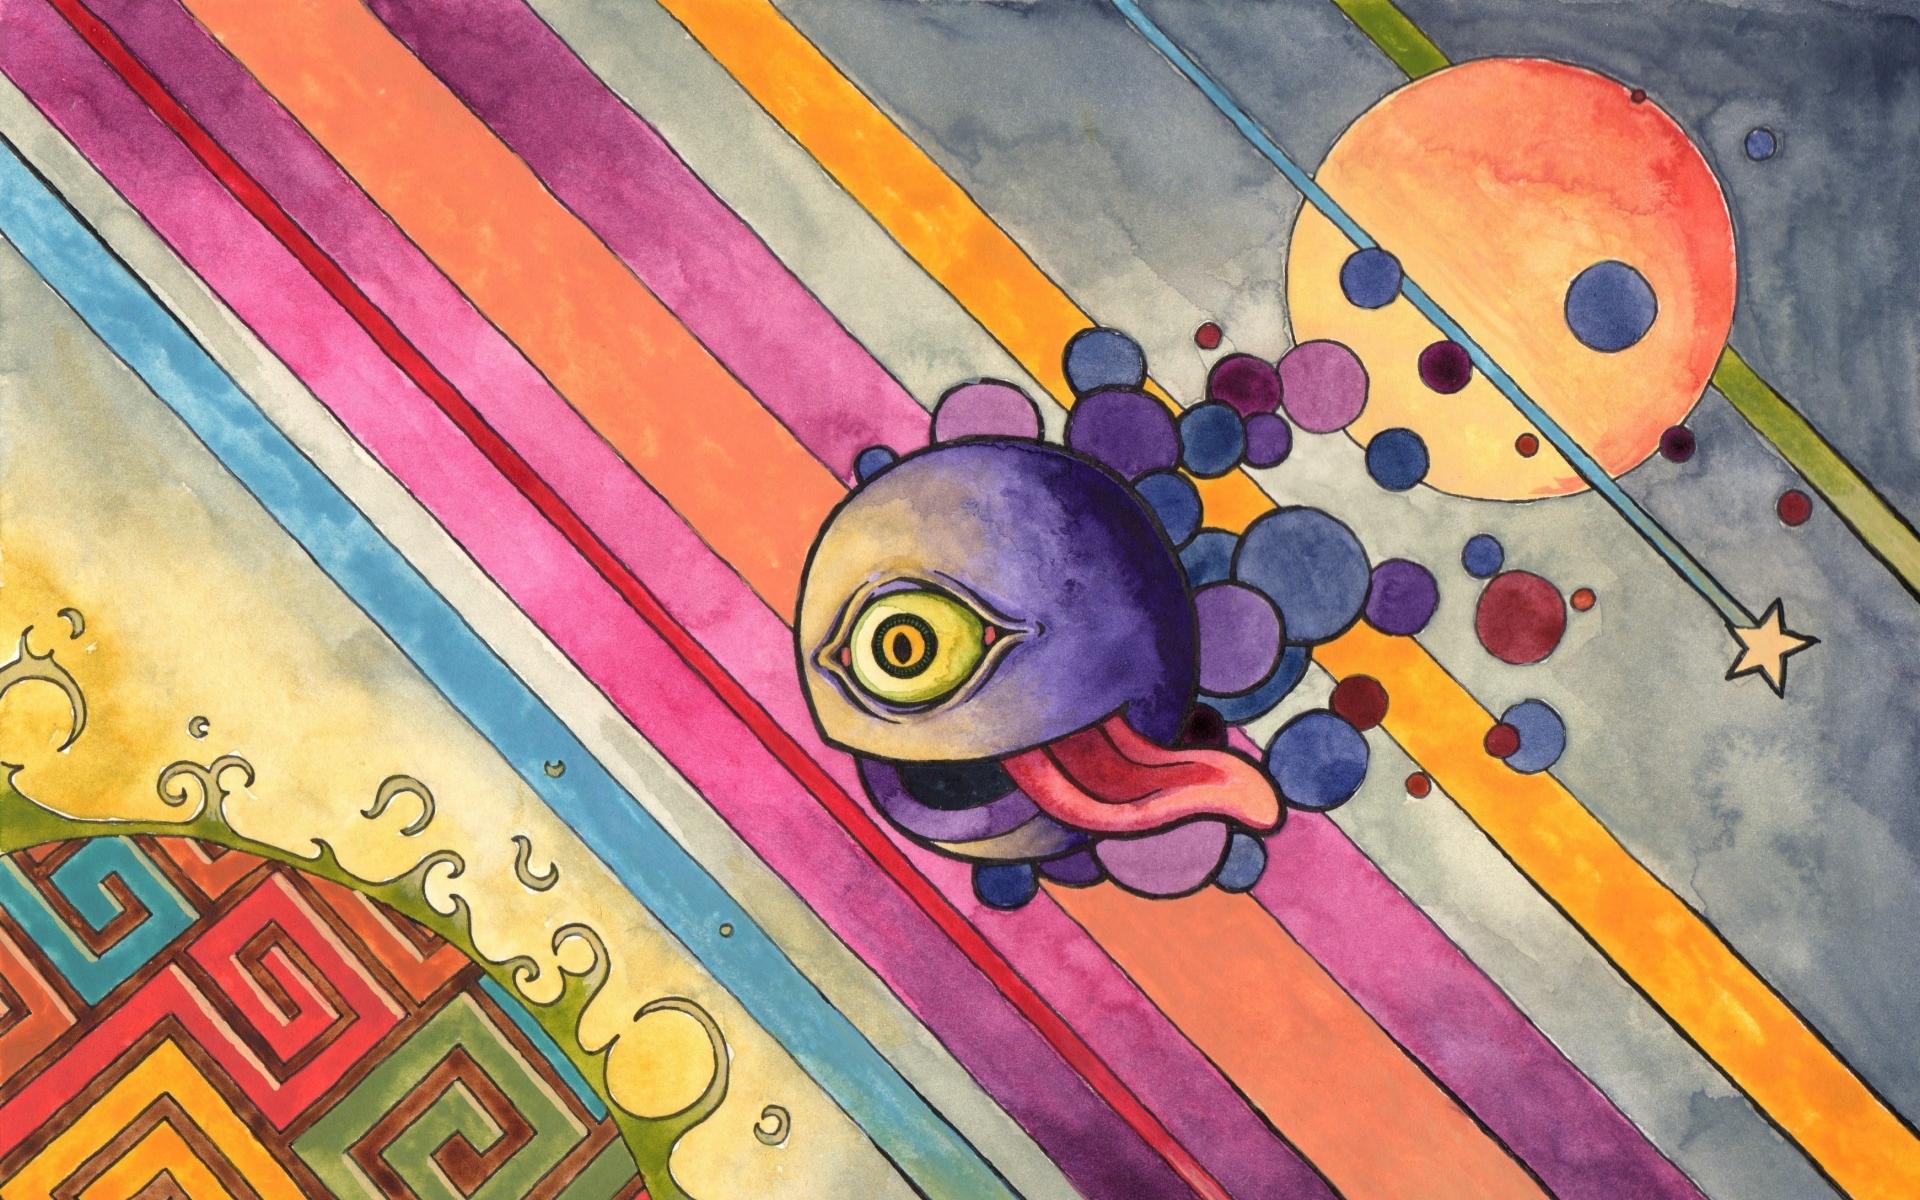 Ikerya Project Full On Acid wallpaper - 943369